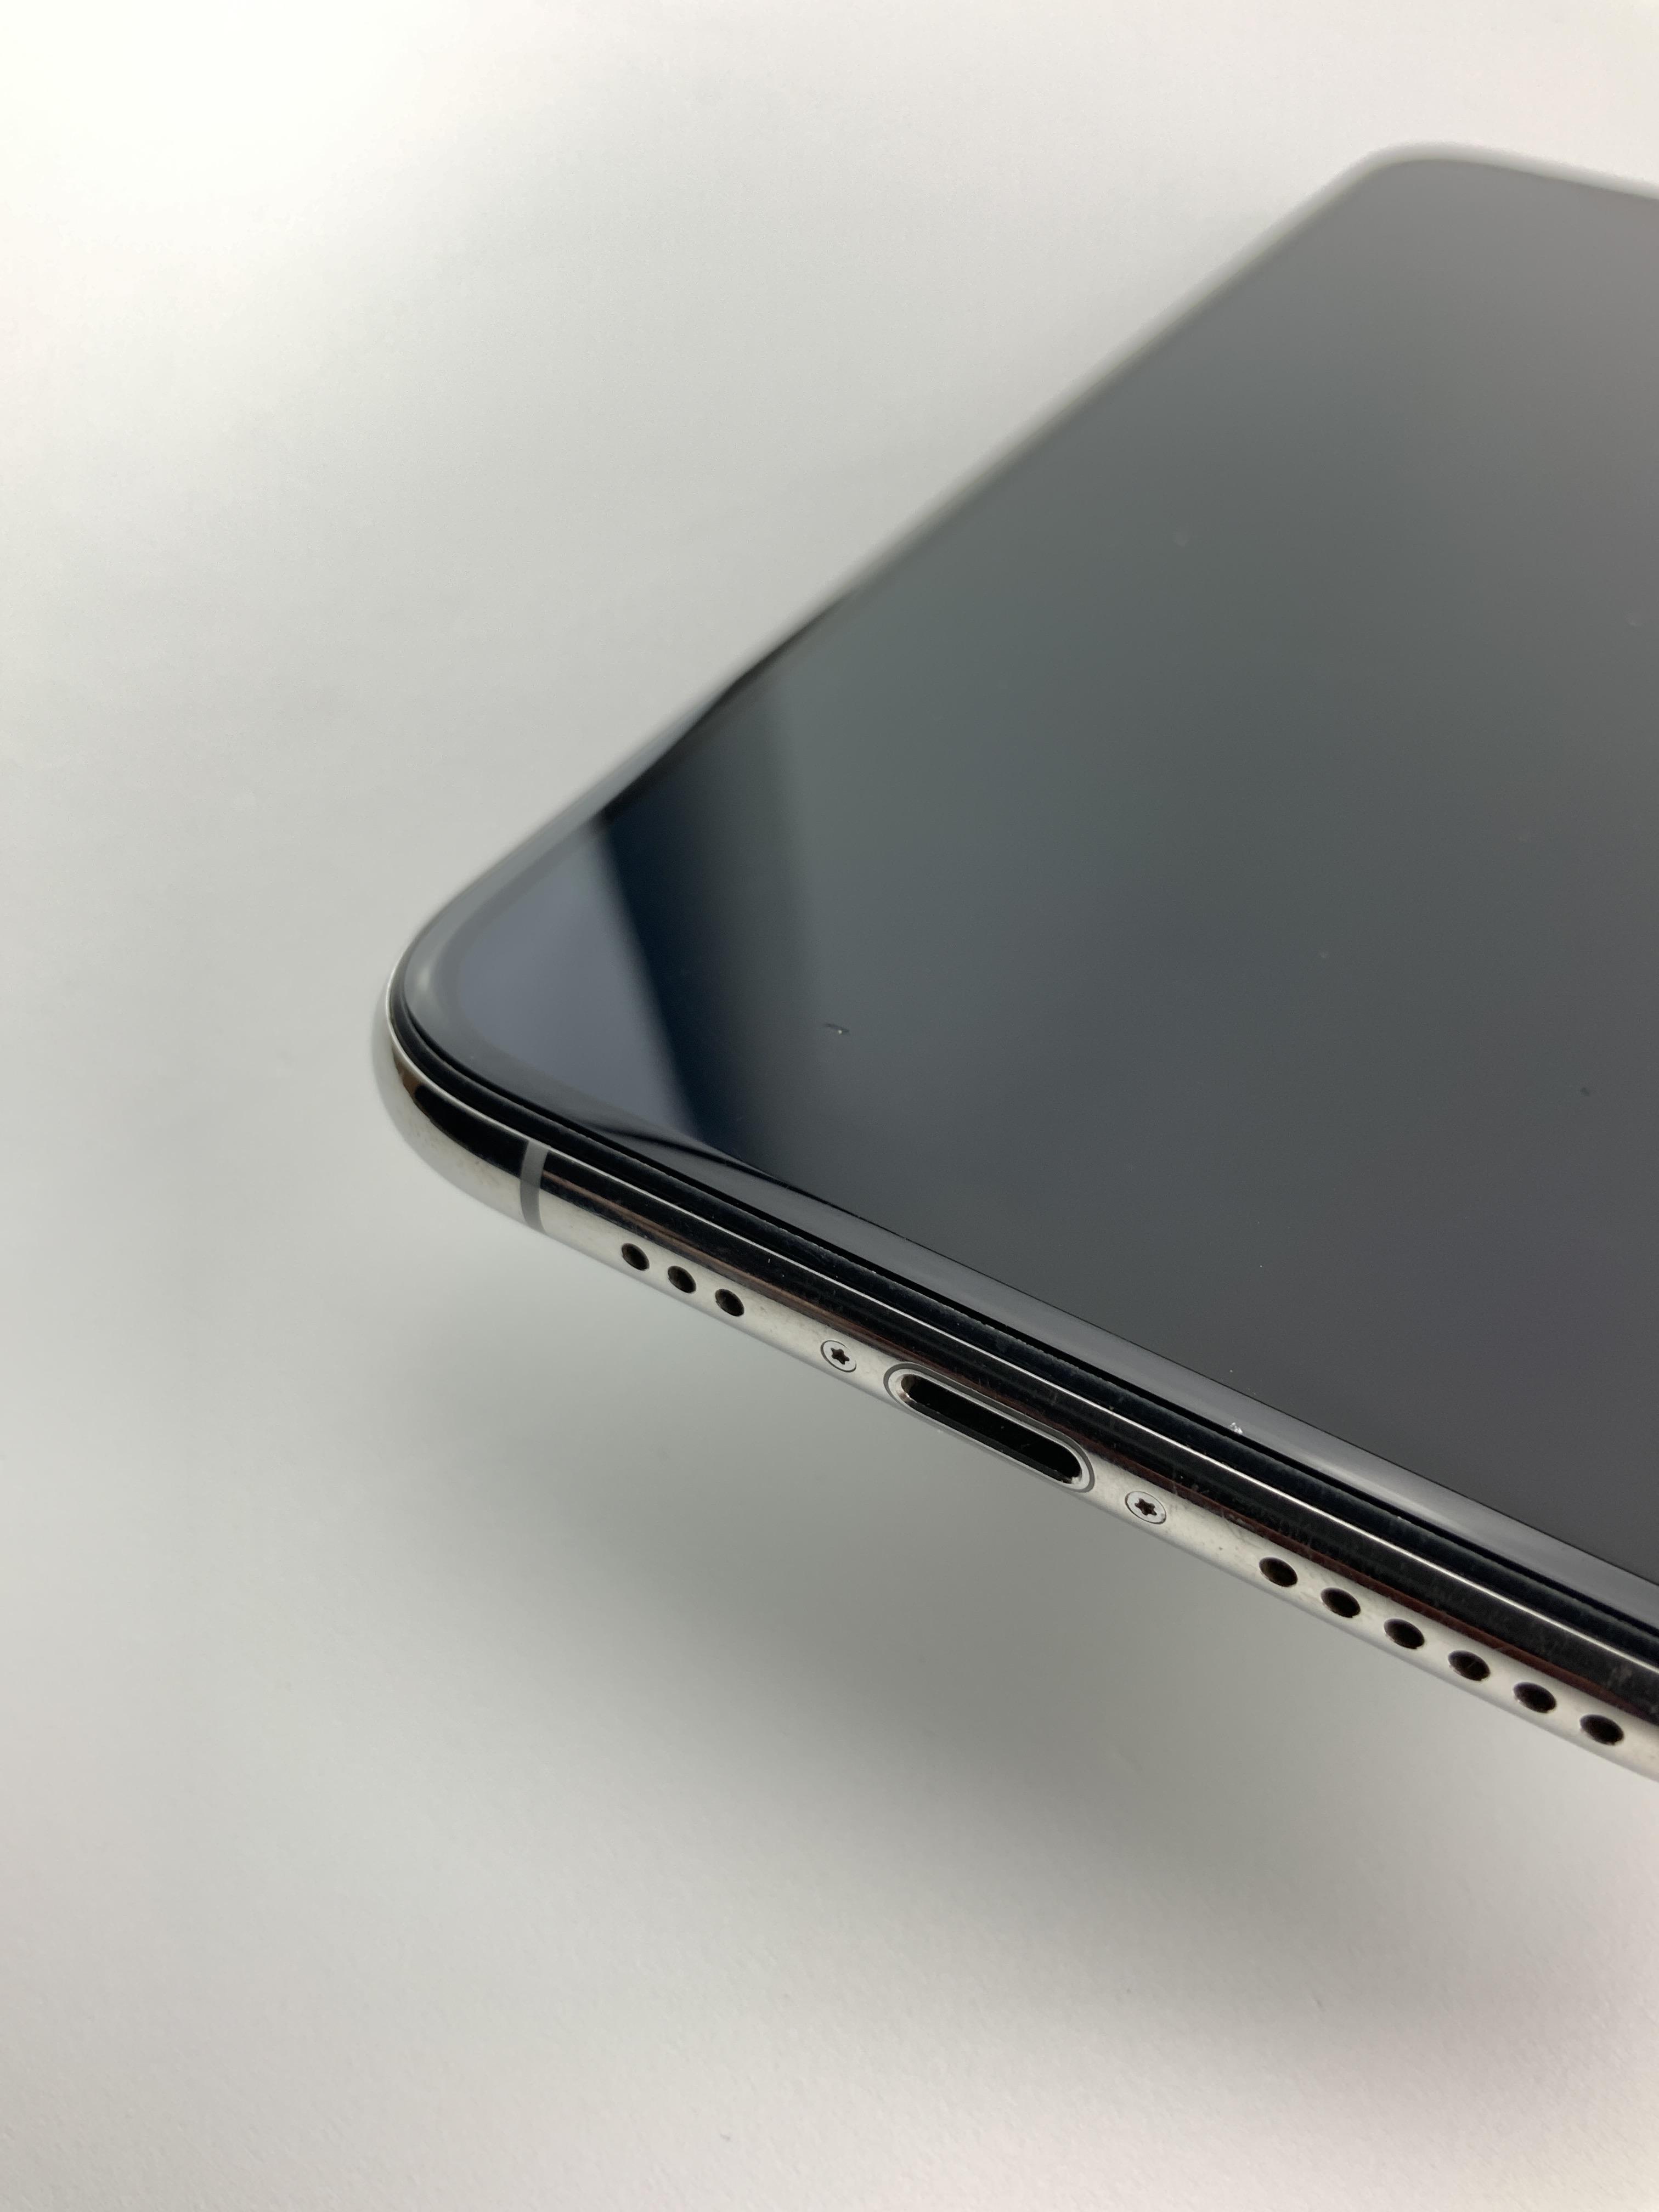 iPhone XS 256GB, 256GB, Silver, Kuva 3